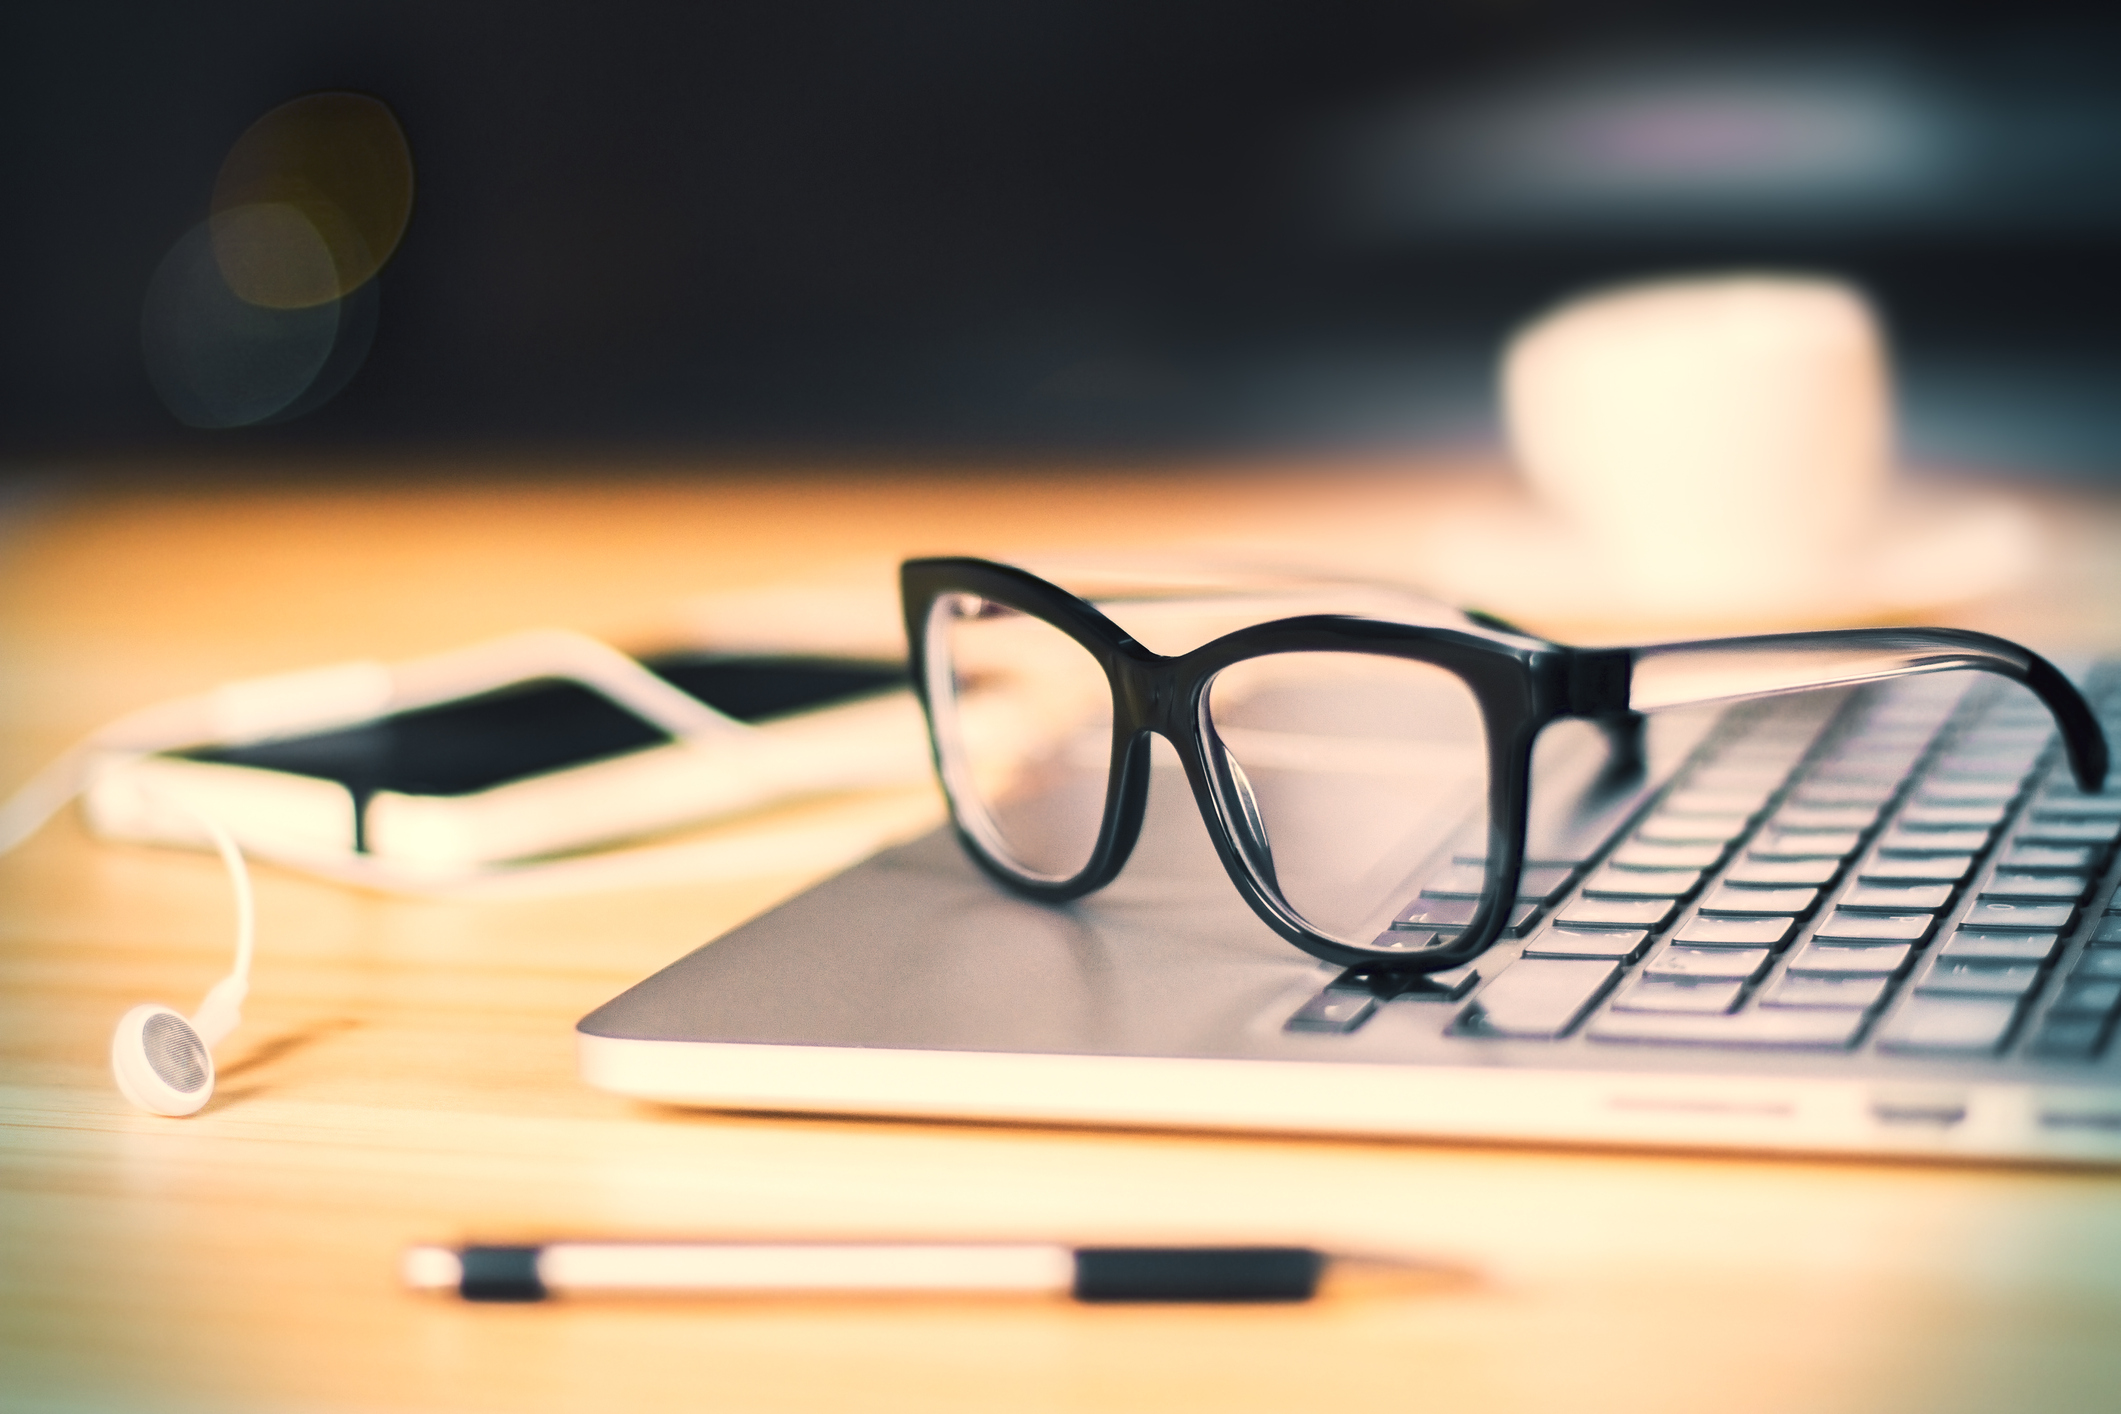 eyeglasses on laptop